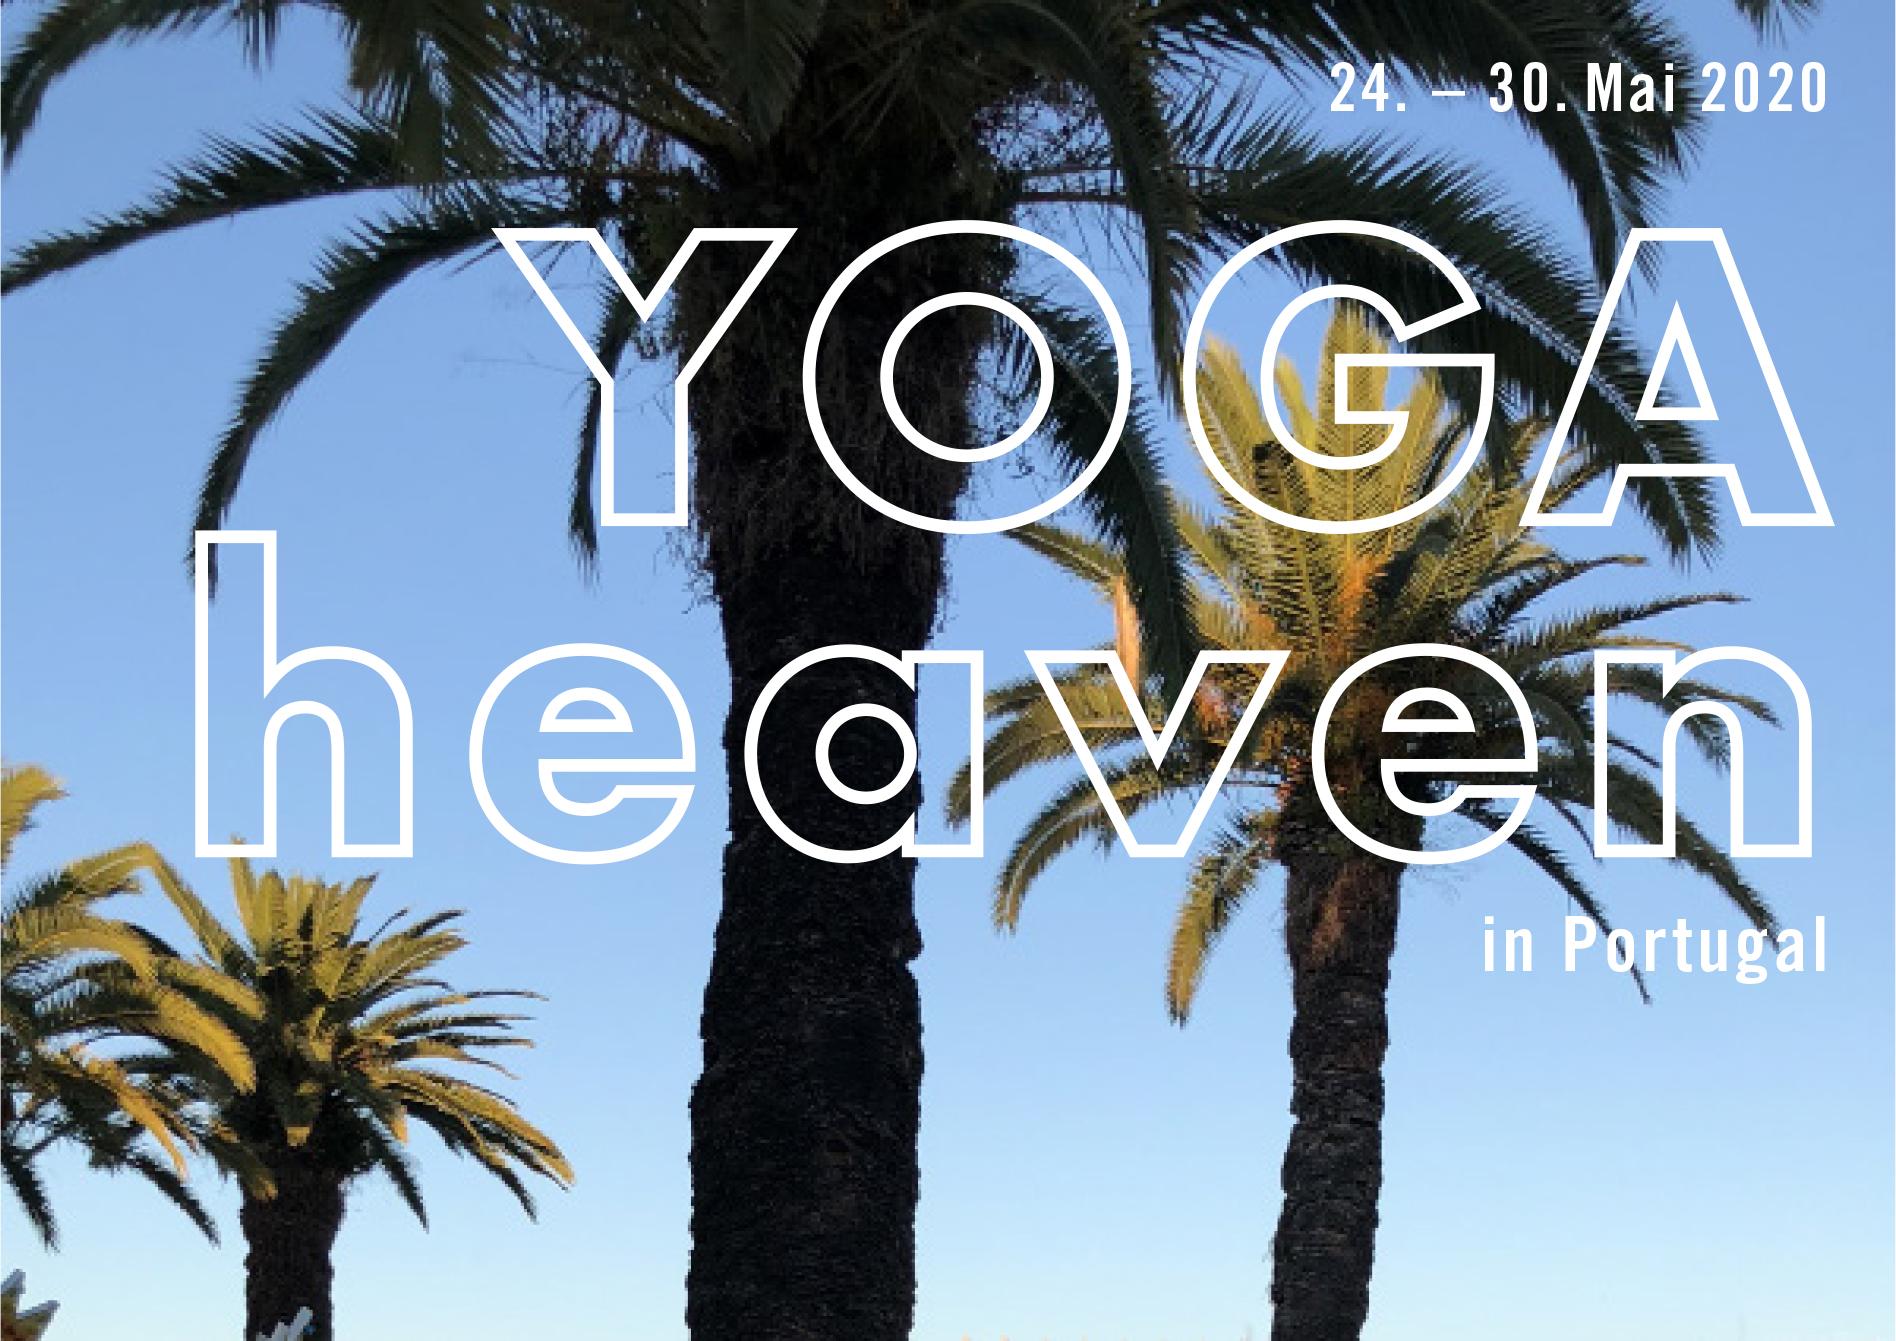 yogaheavenohnewebseite.jpg